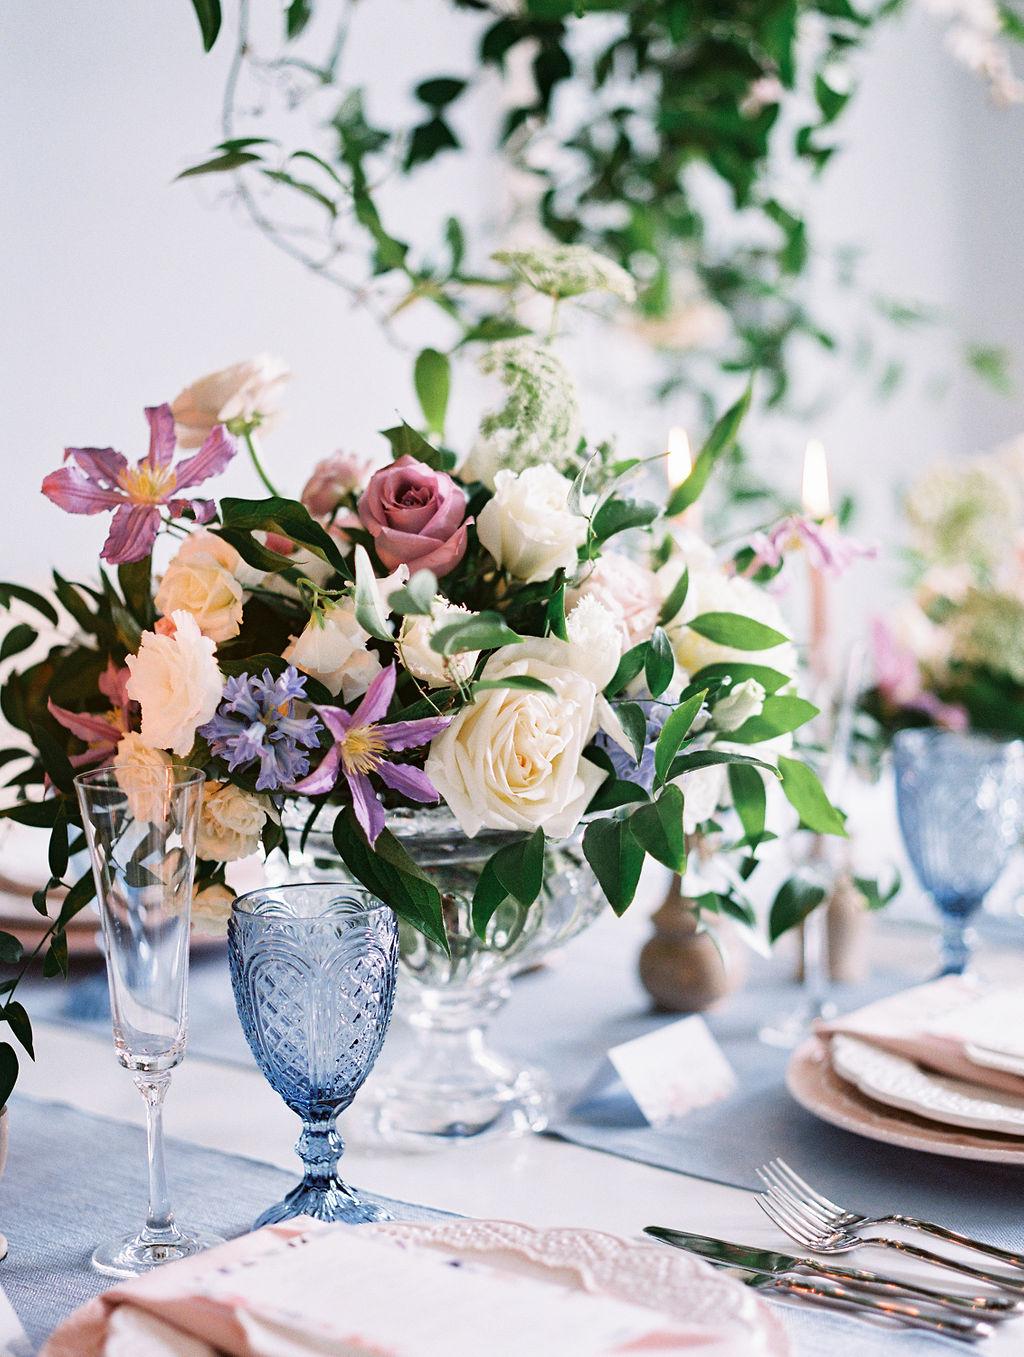 Romantic-French-Garden-WhitneyHeardPhotography-6011128-R1-E005